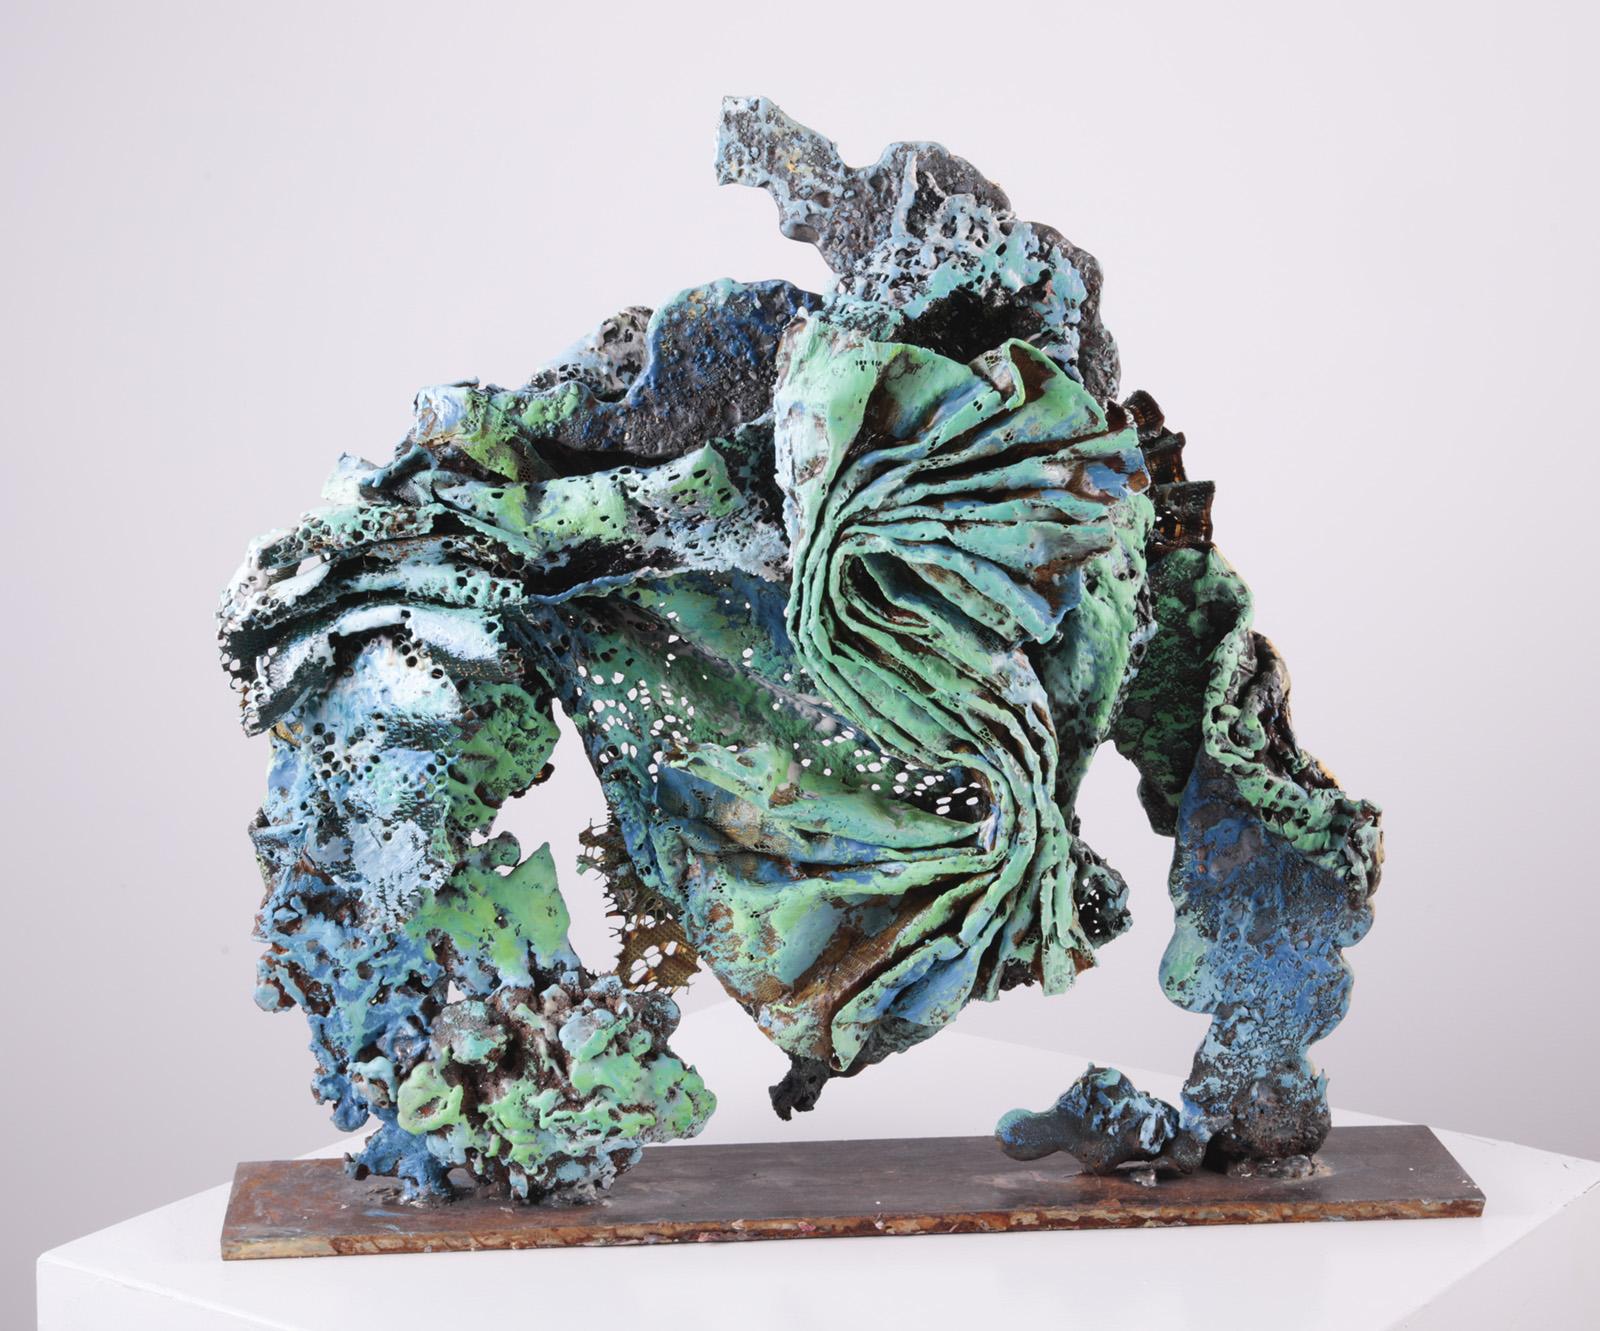 Darlington_WarmedByaHotRock_Sculpture1.jpeg